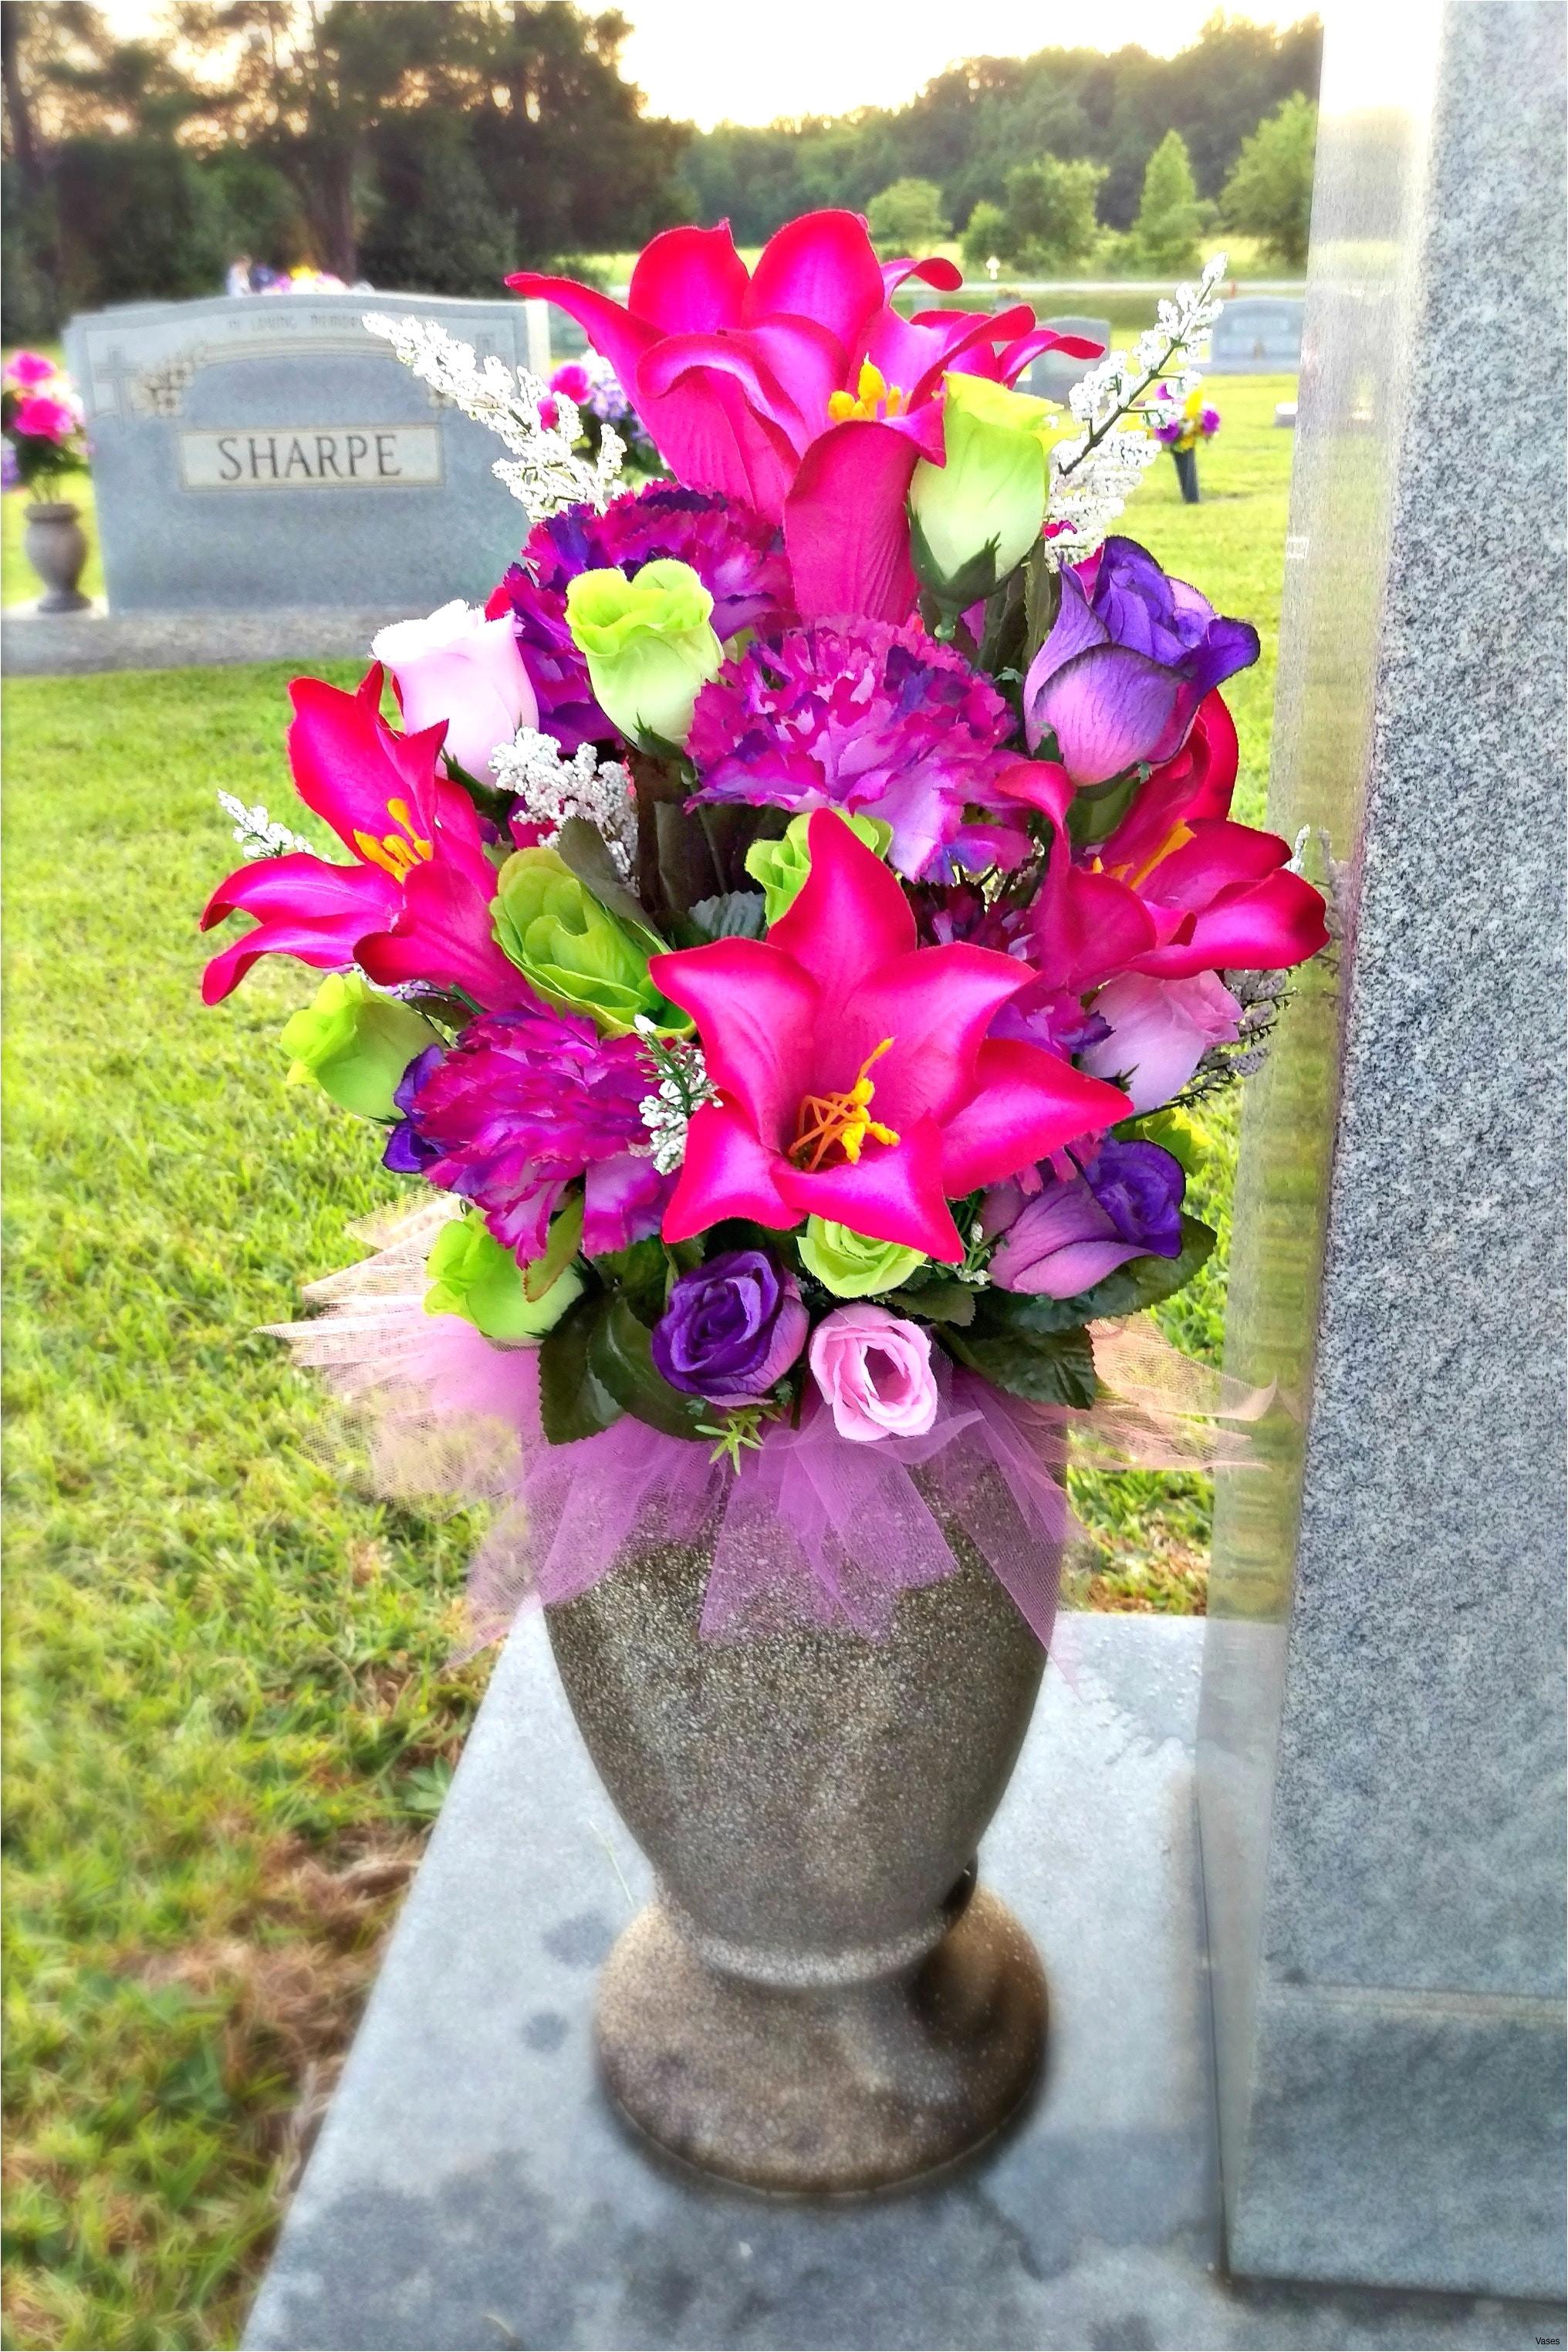 Cemetery Decoration Ideas Flower Vase Decoration Ideas Awesome Vases Grave Flower Vase